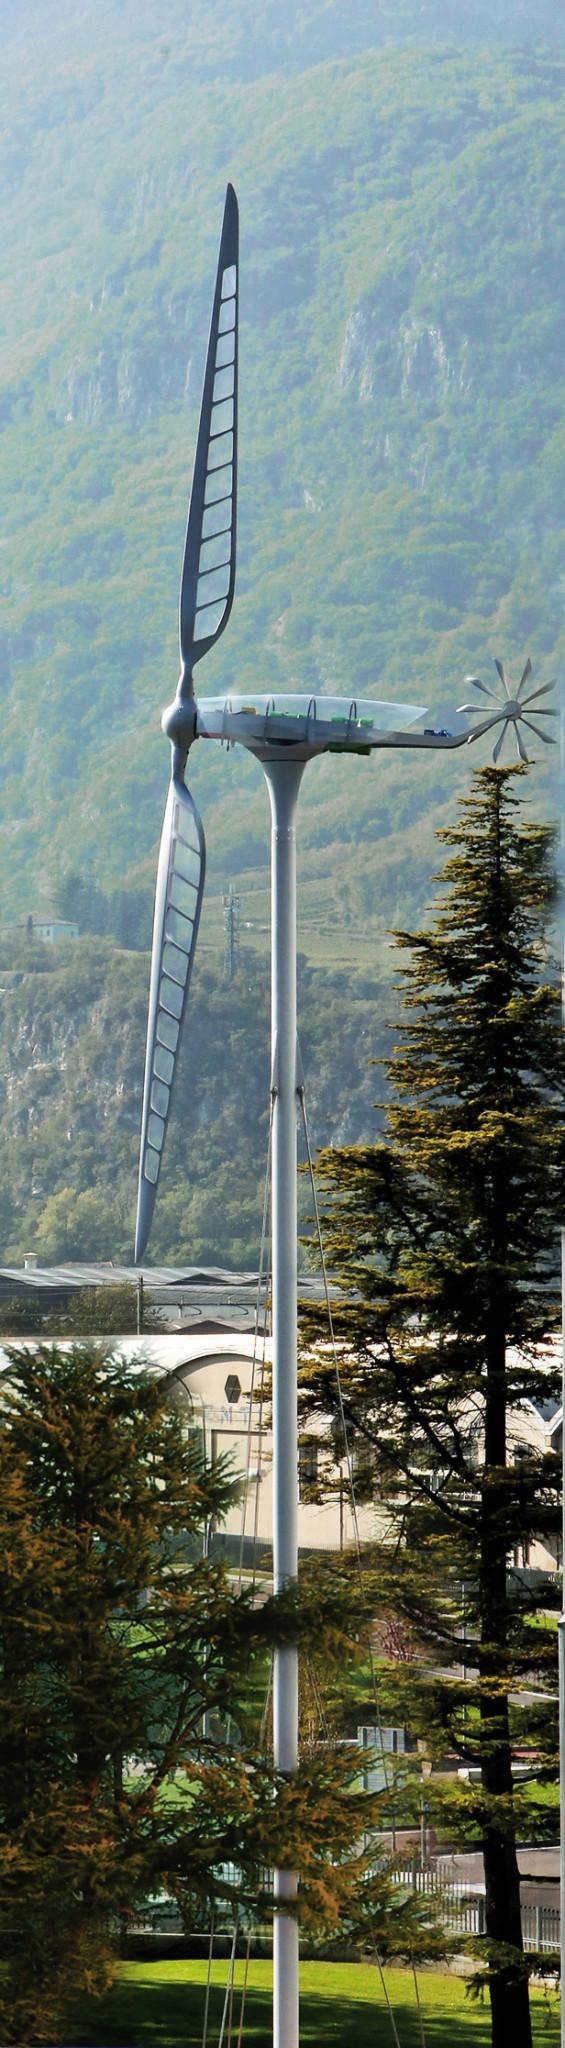 Pala eolica, Genova (Foto: Stefano Goldberg)